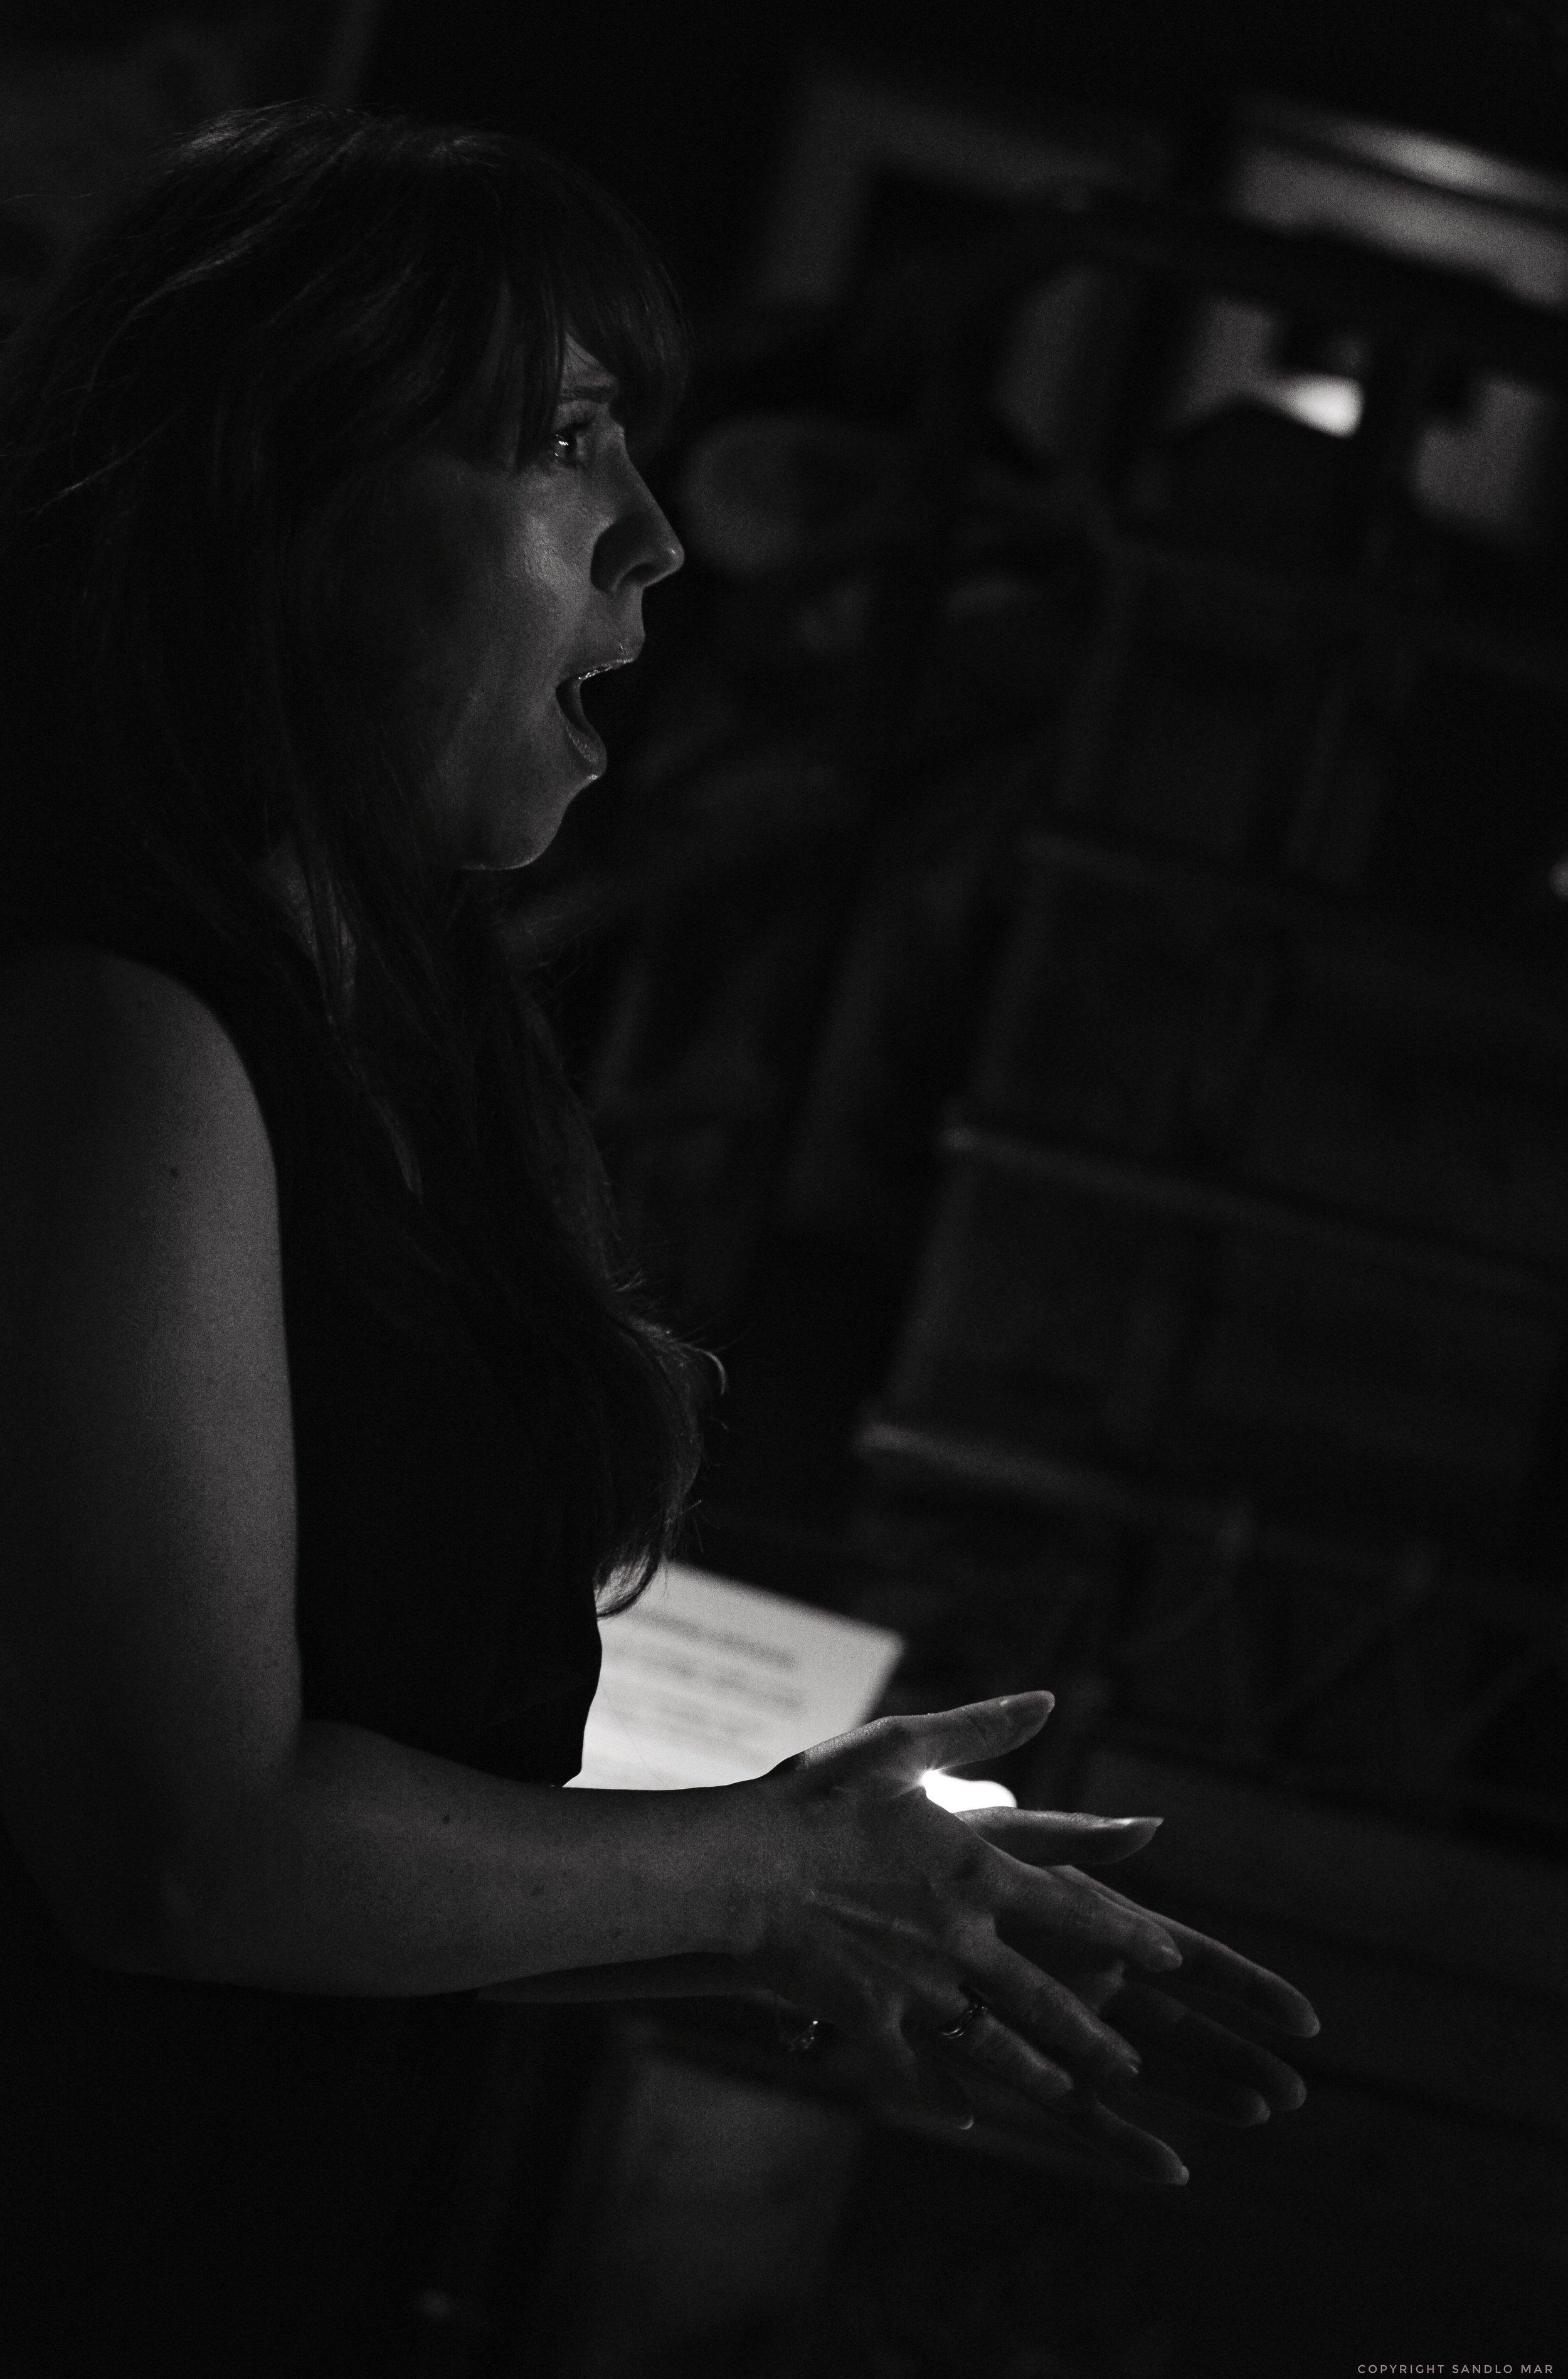 Soprano Mariann Fjeld-Solberg with the lovely mermaid aria.